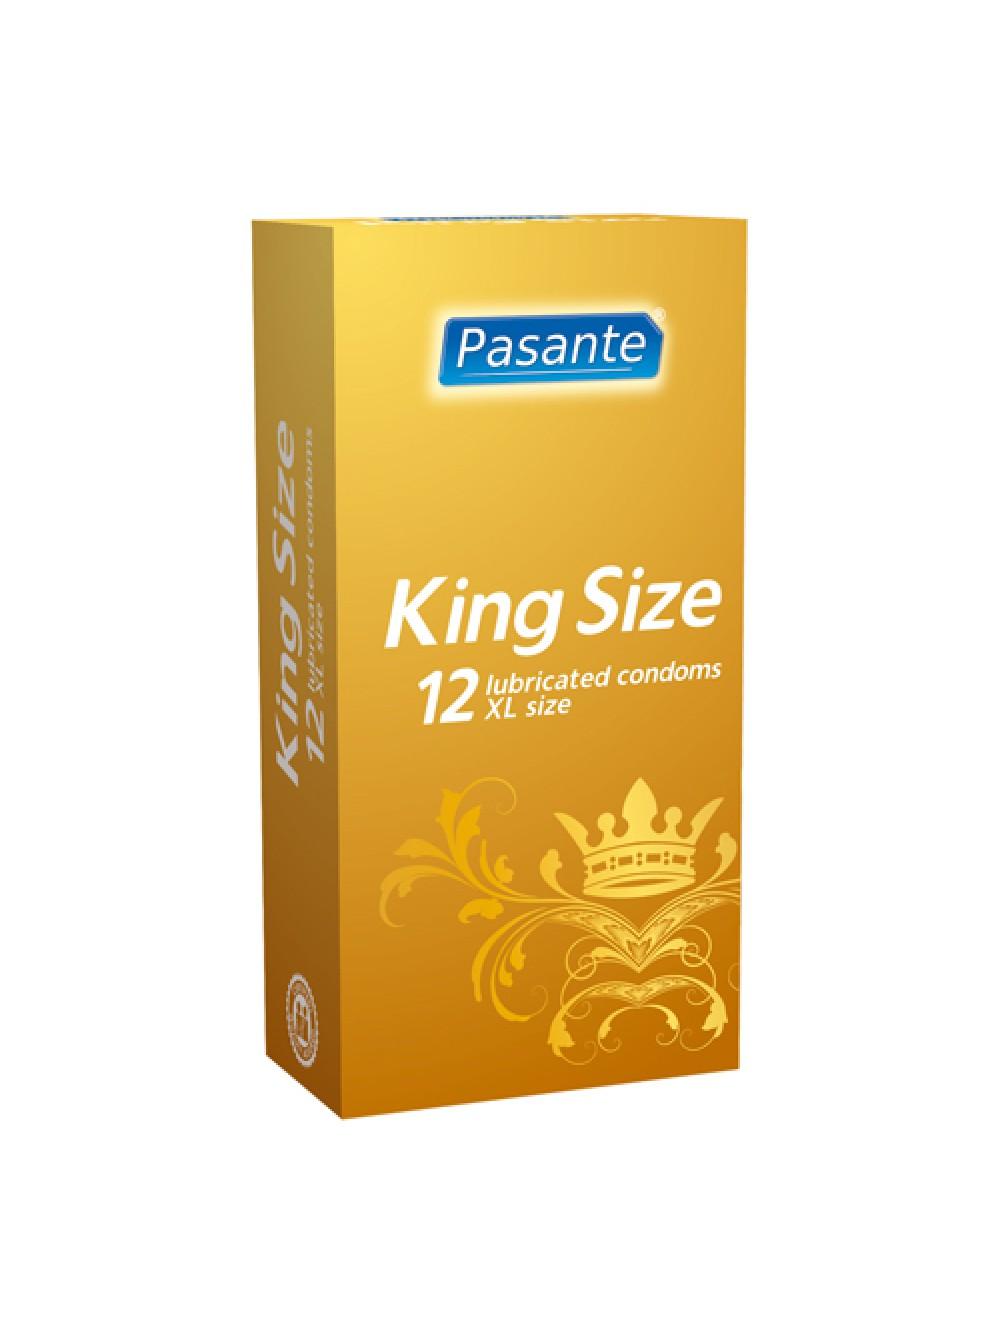 King Size 12 p.